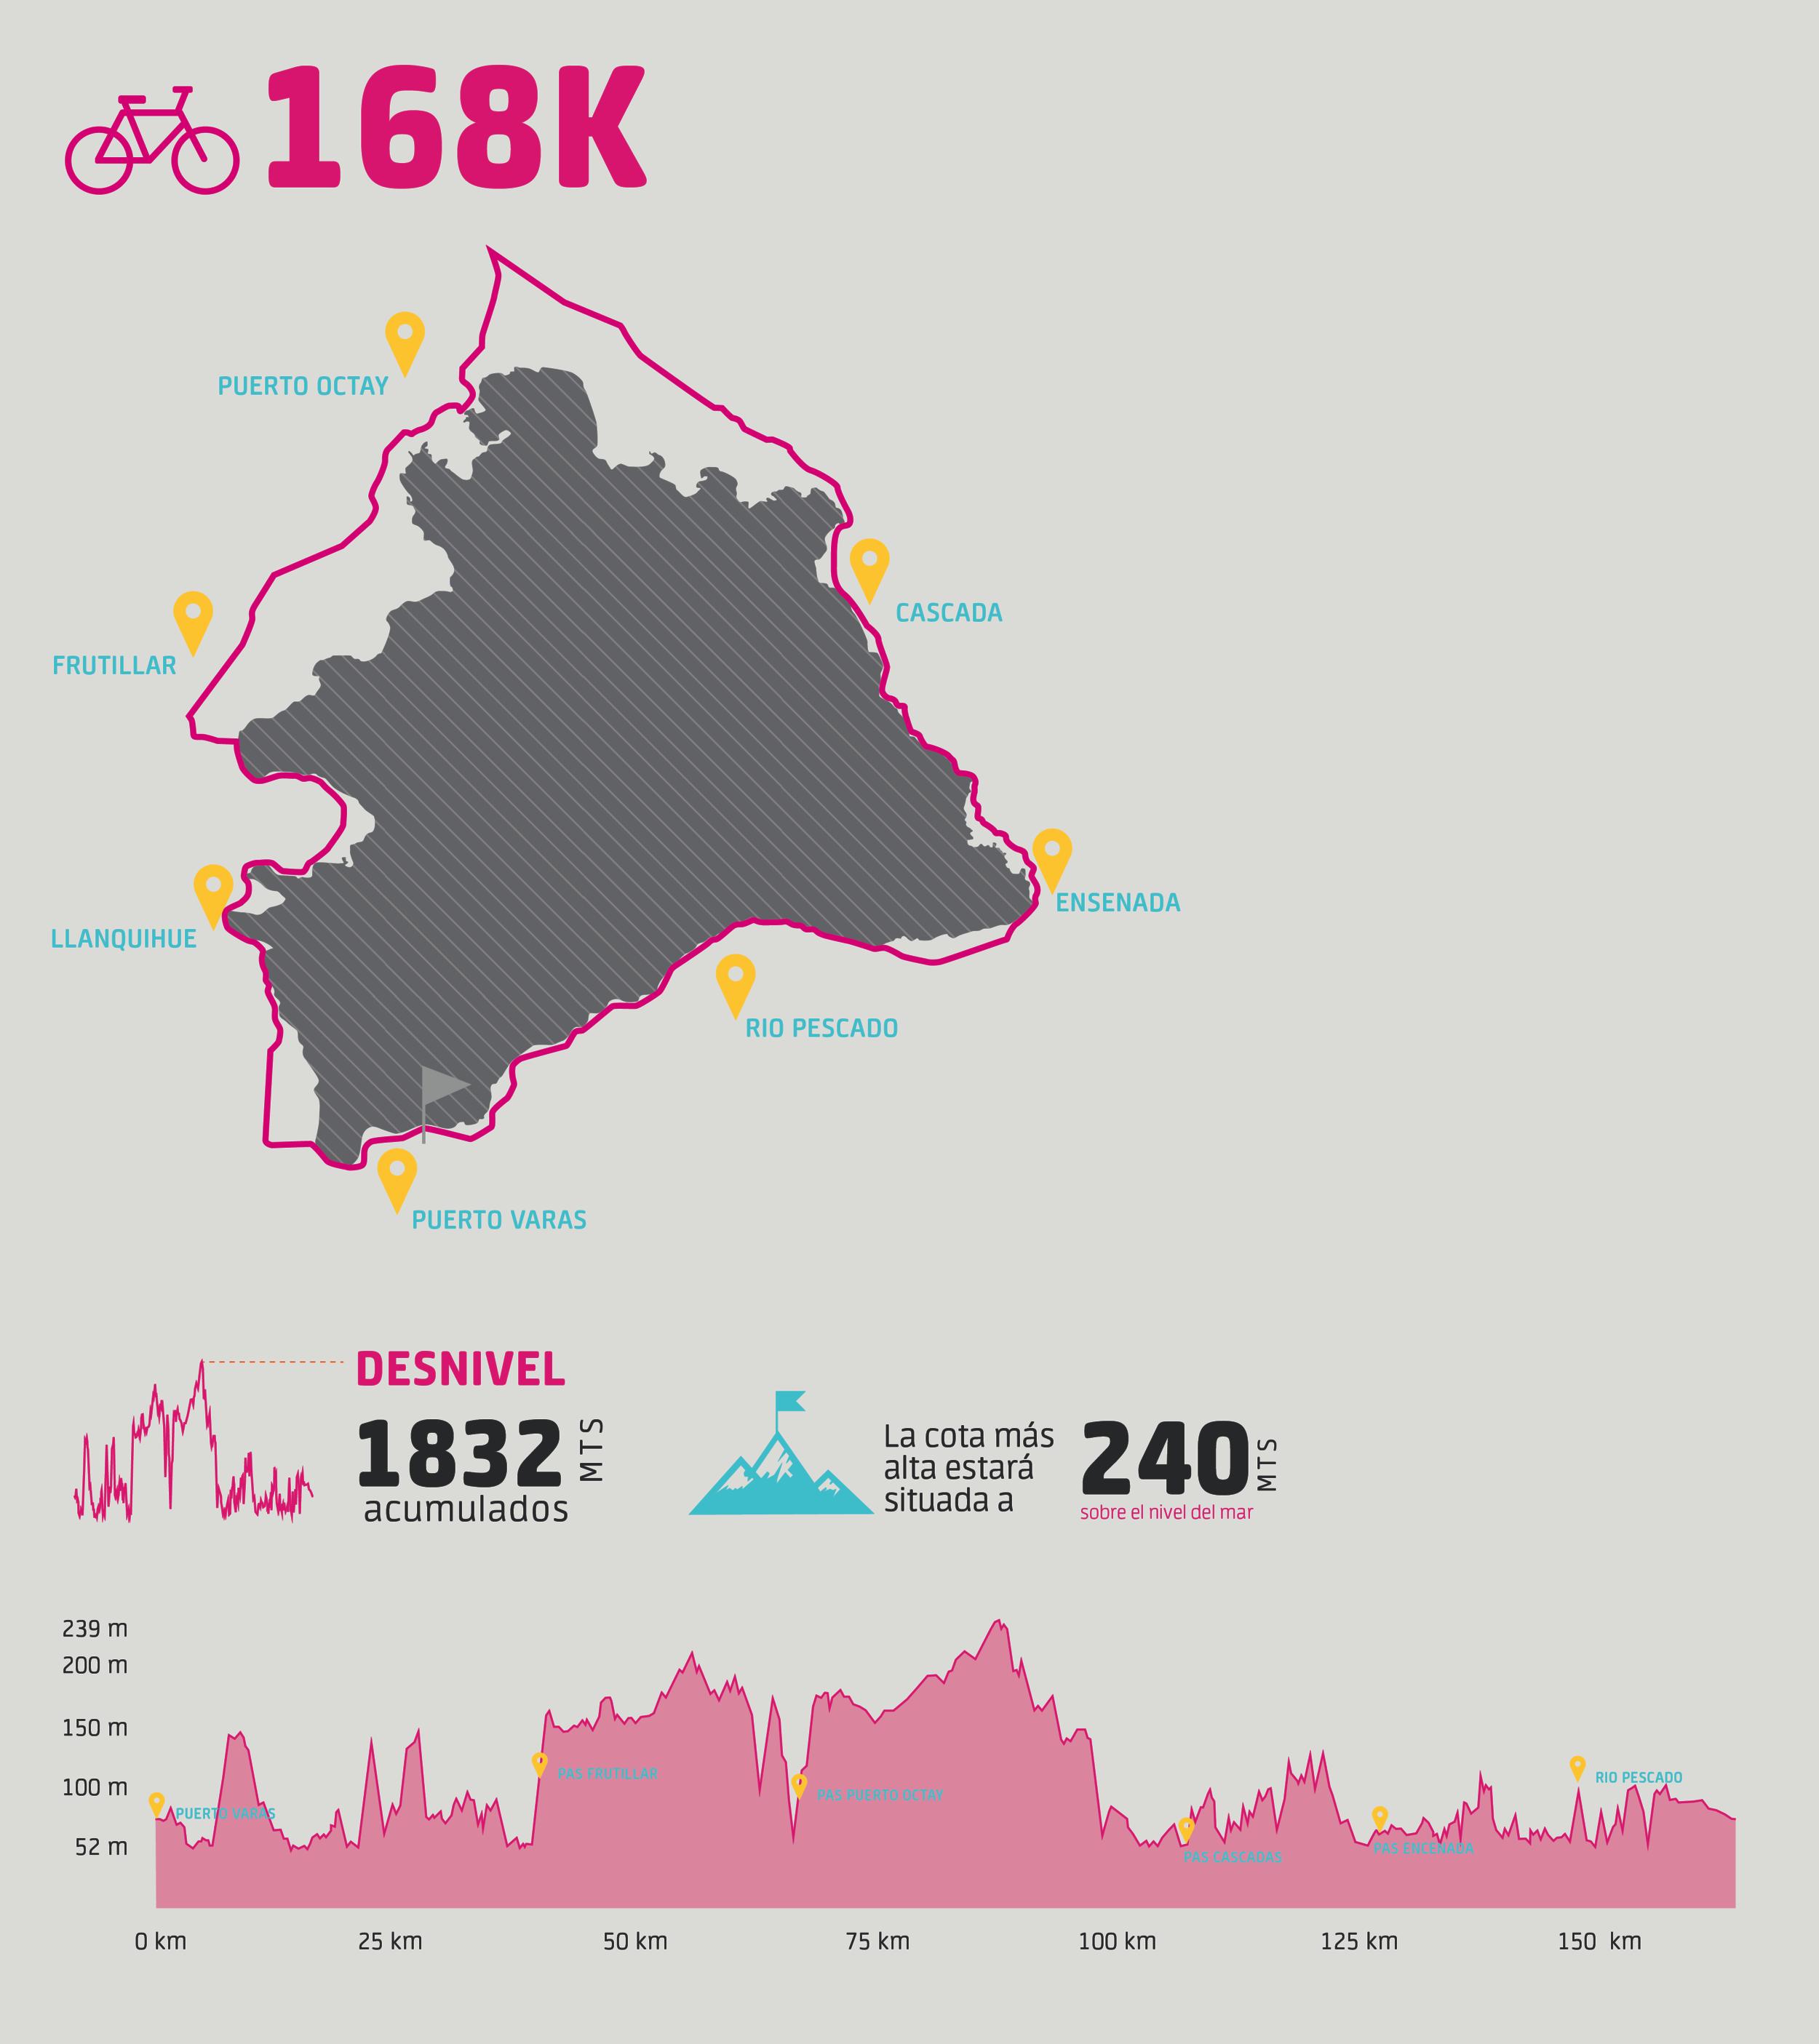 168 kilómetros con 1.832 metros de desnivel vertical, pasando por Puerto Varas, Llanquihue, Frutillar, Puerto Octay, Cascadas y Ensenada. -